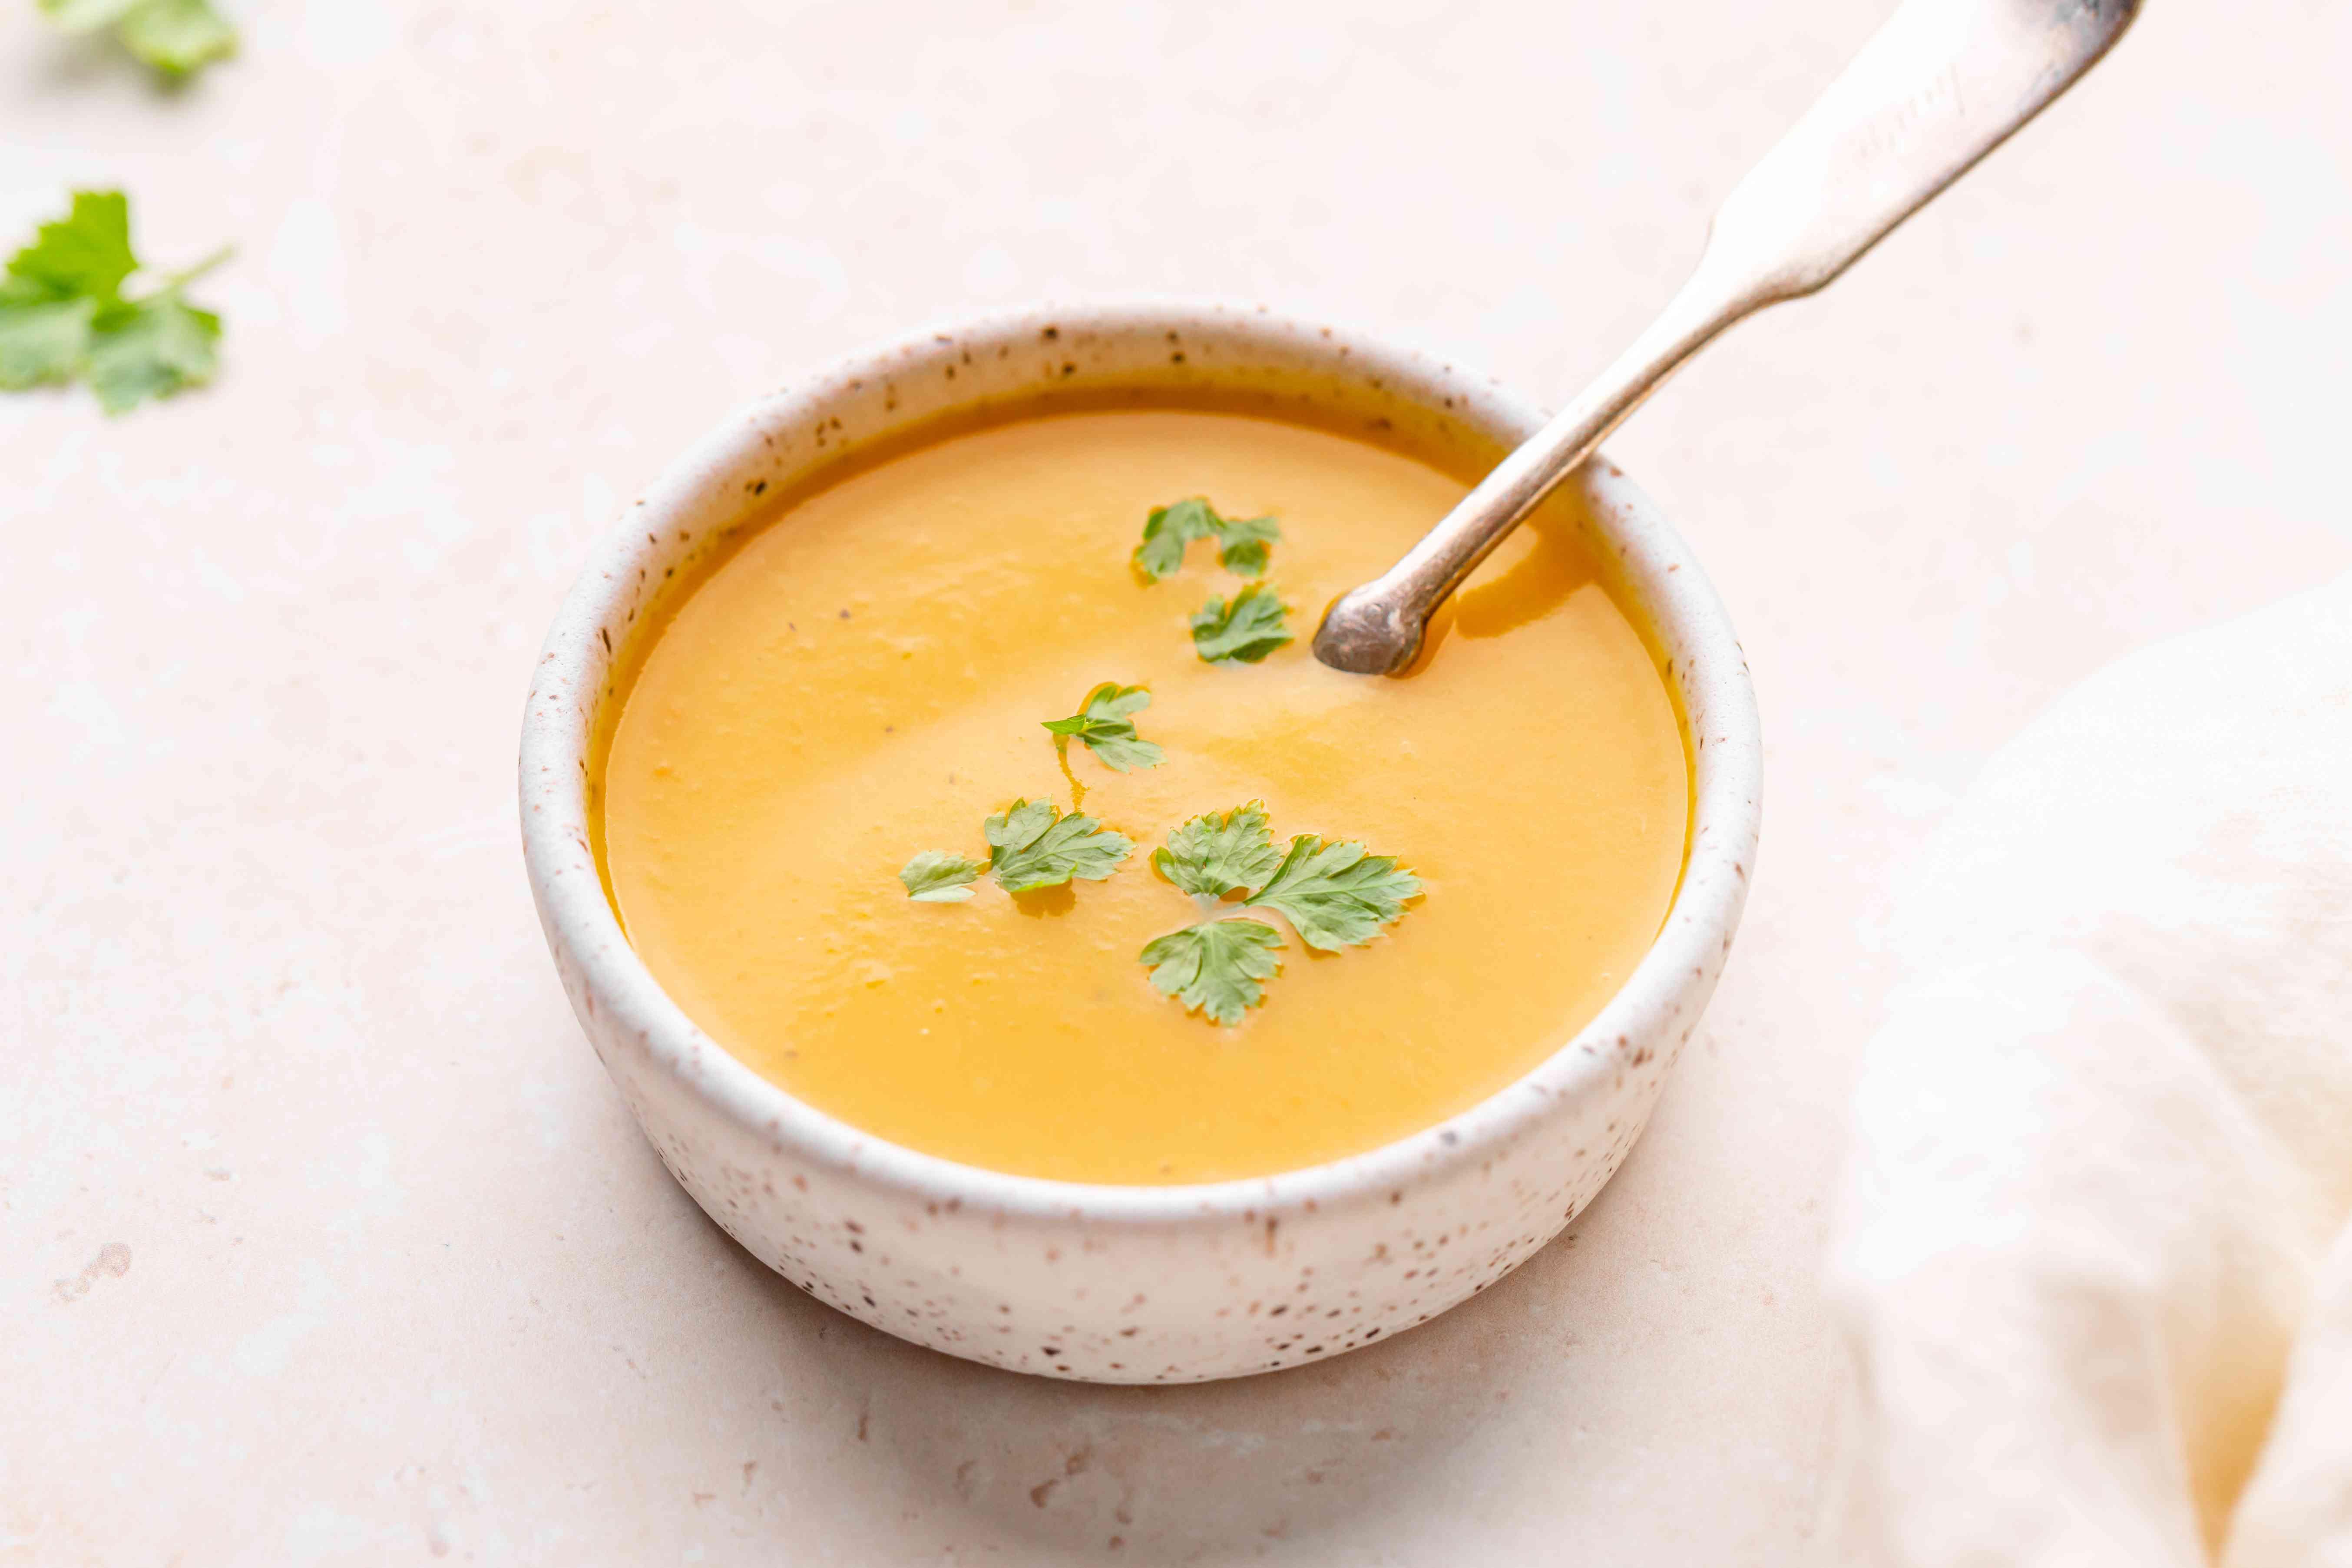 A bowl of butternut swuash soup.